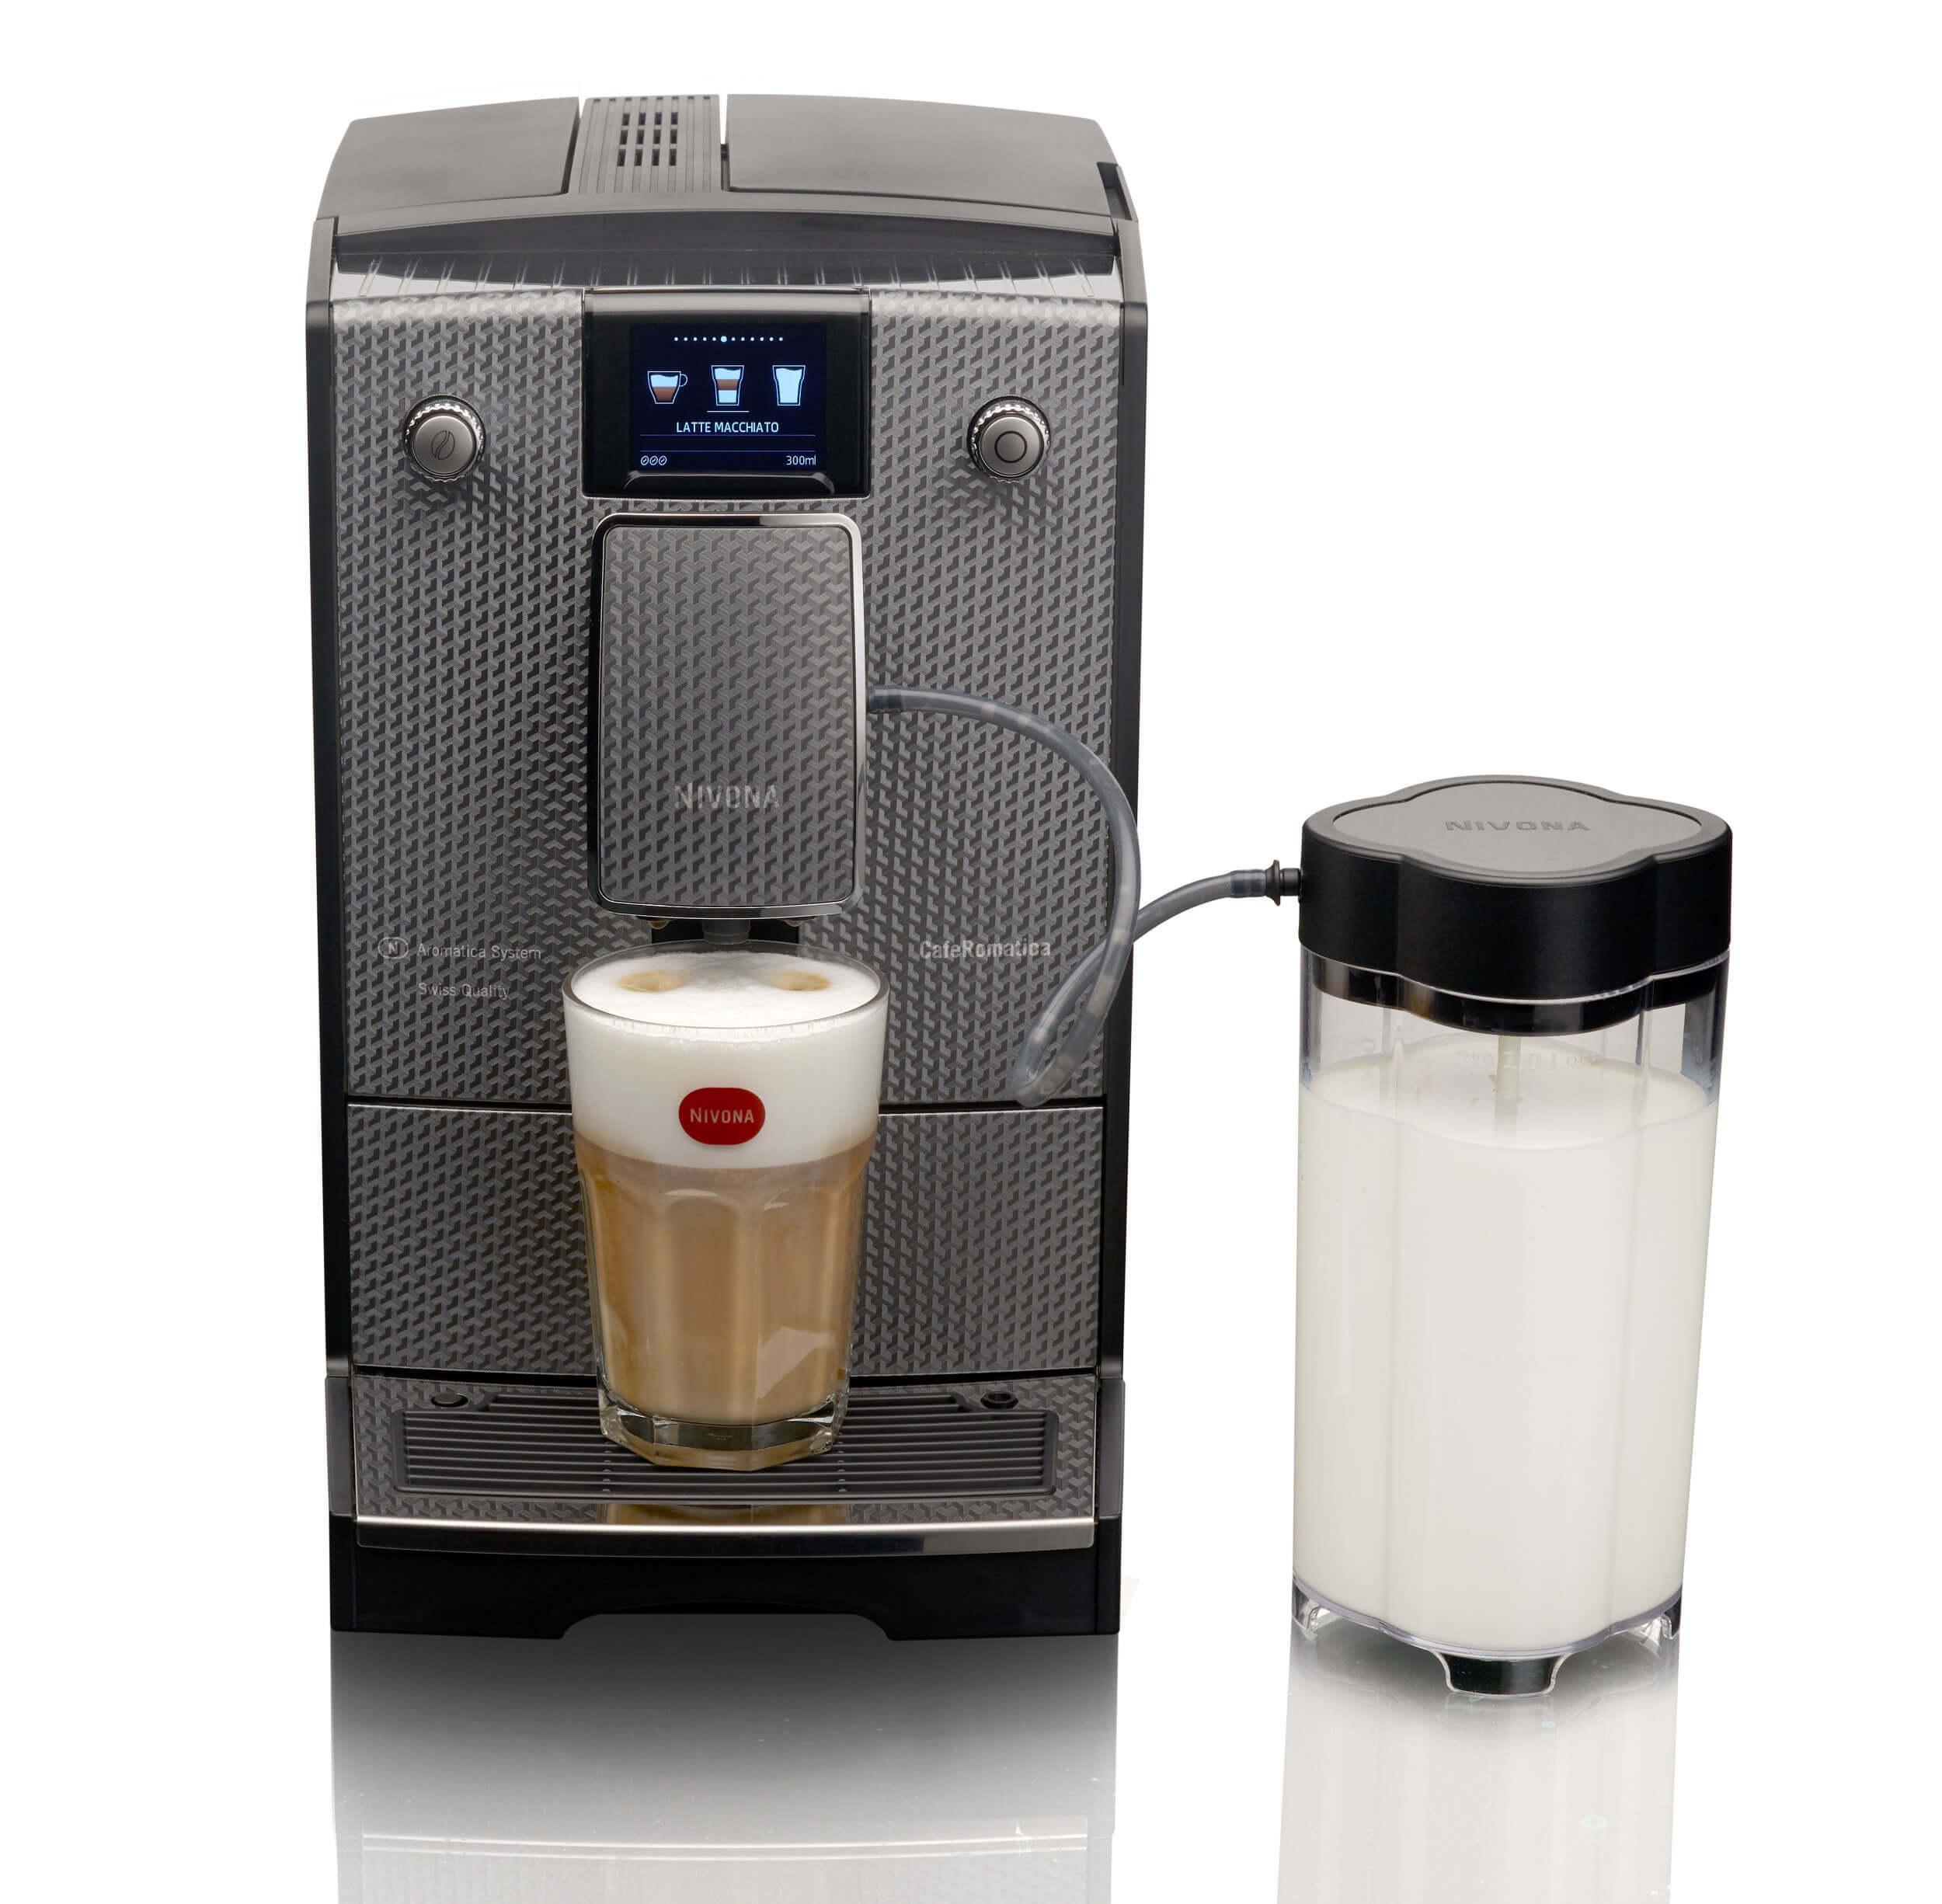 Nivona Kaffeevollautomat Cafe Romantica NICR 789 | Kamasega